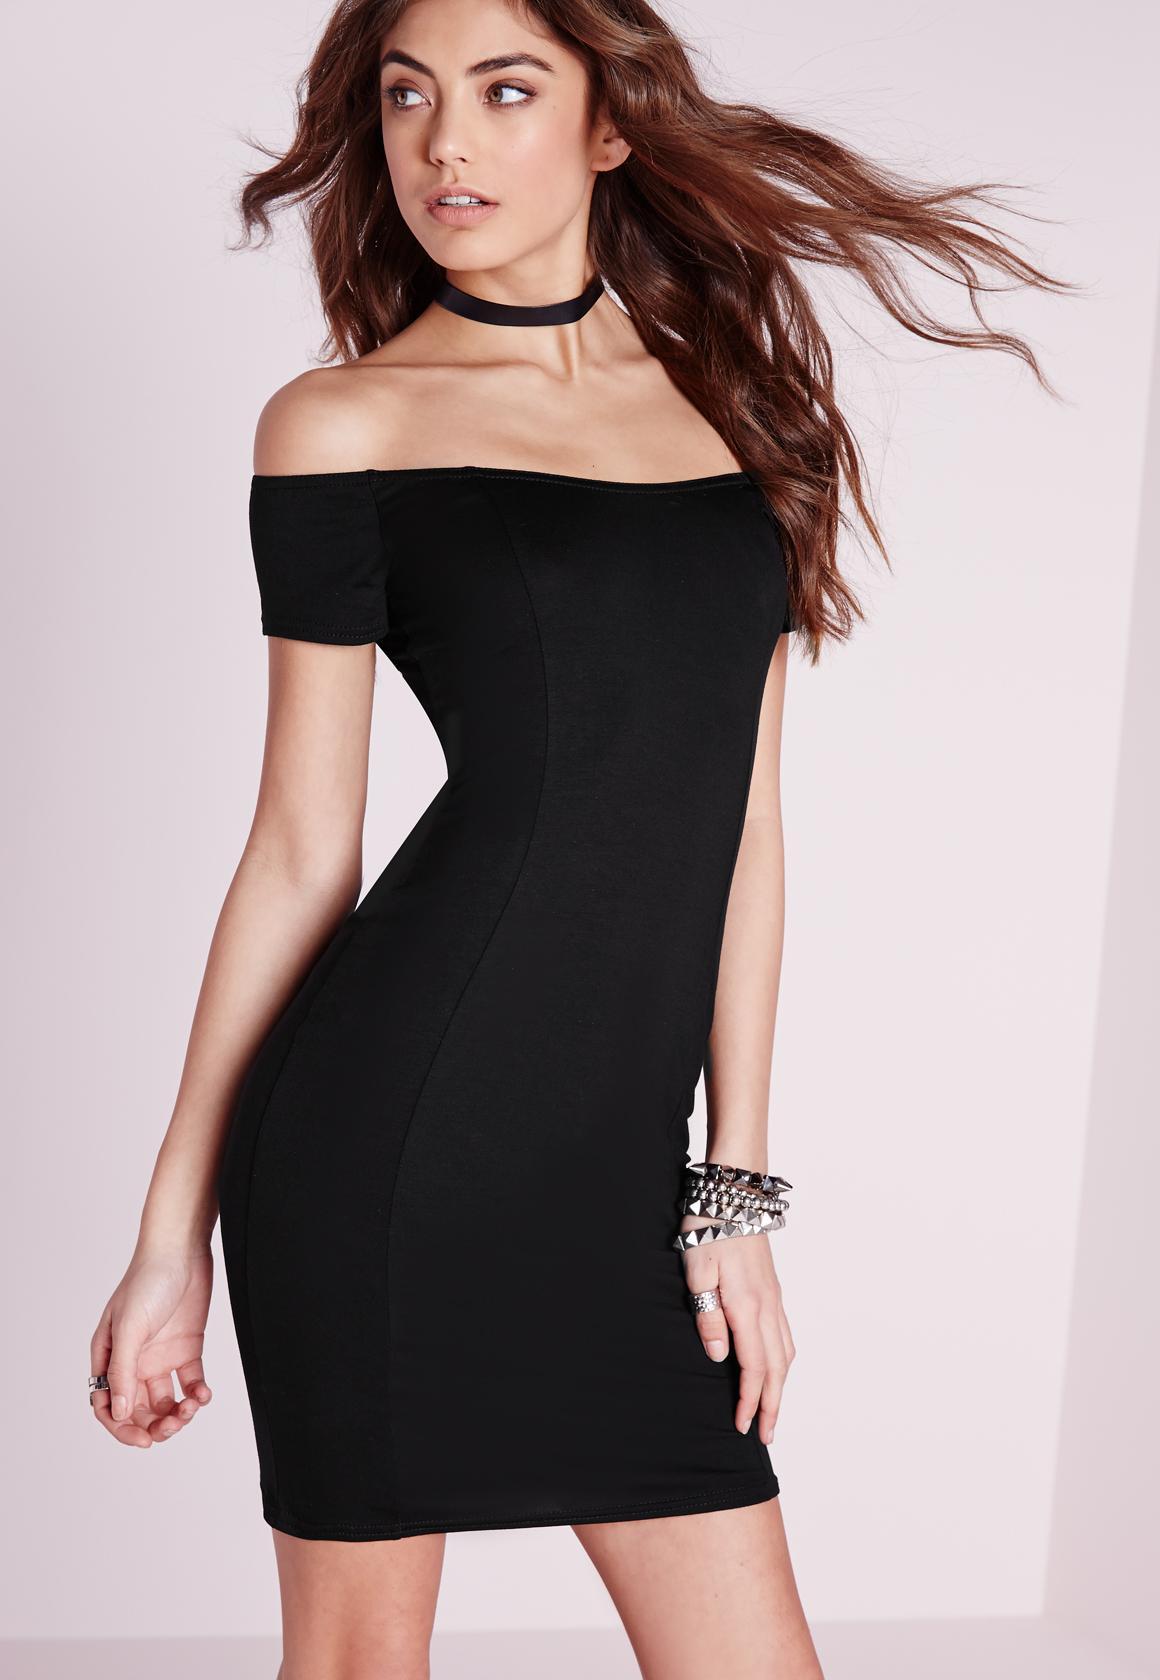 Black dress under knee - Jersey Bardot Bodycon Dress Black Jersey Bardot Bodycon Dress Black